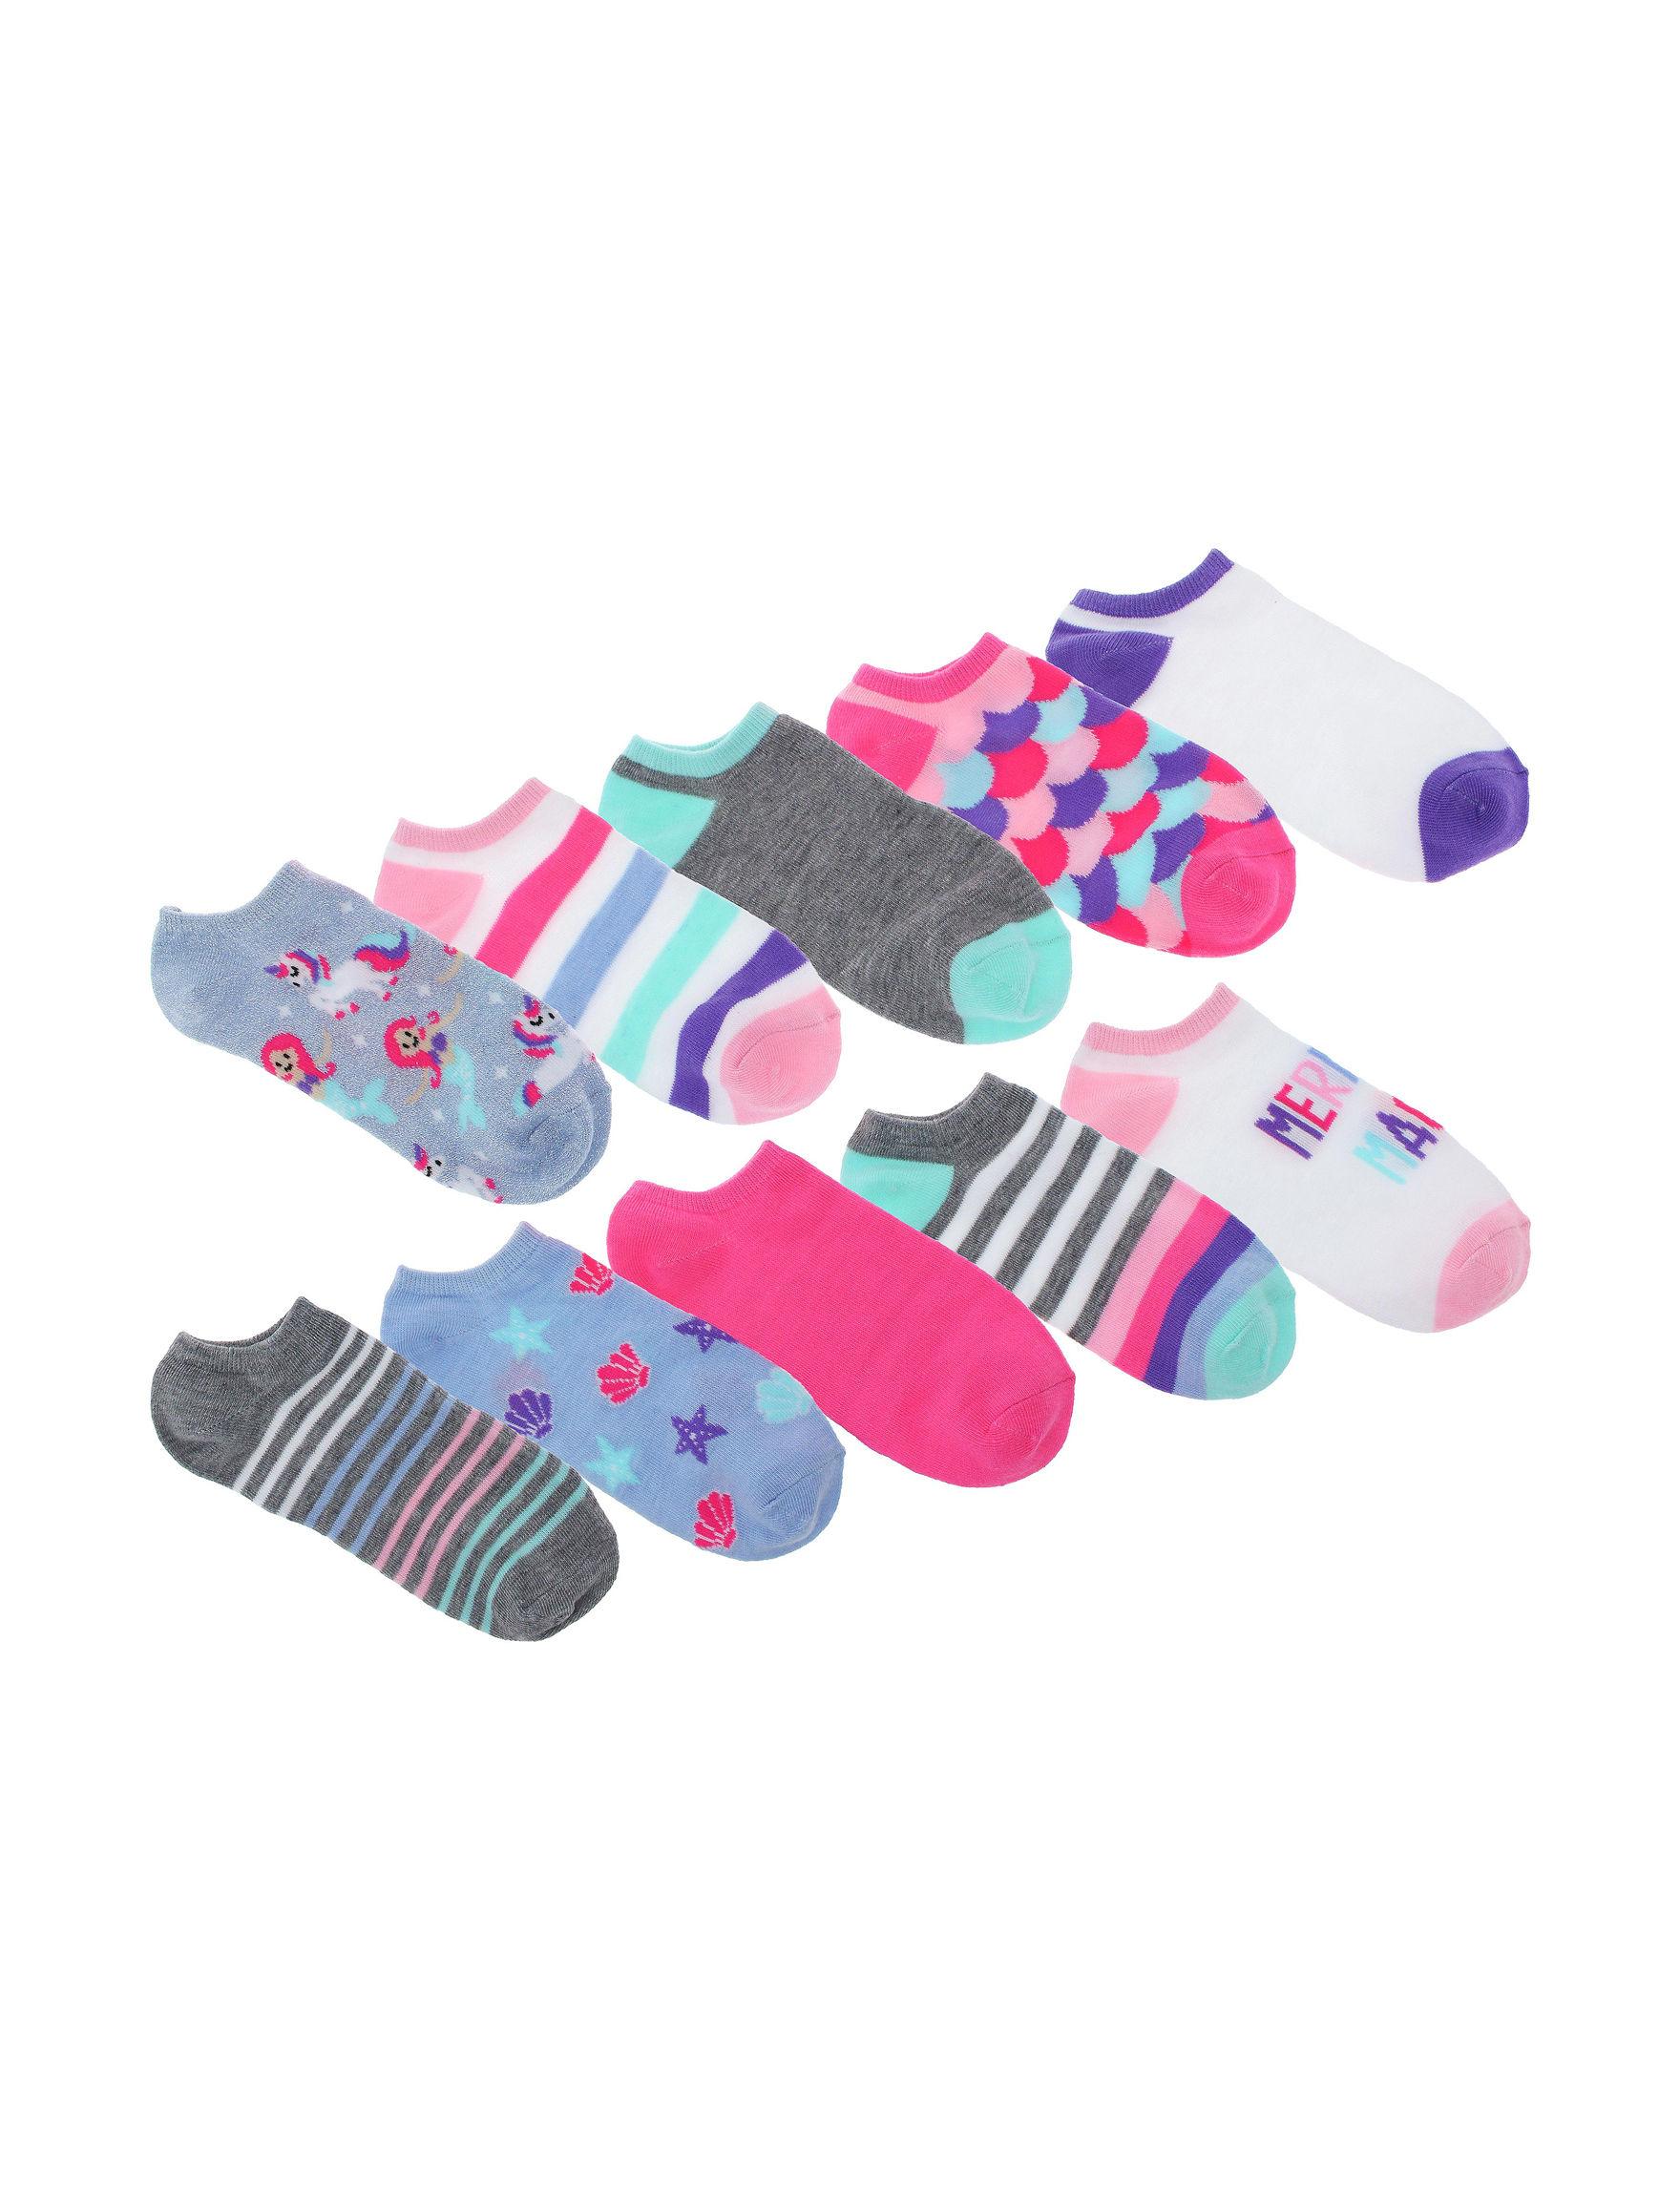 Capelli Blue Multi Socks